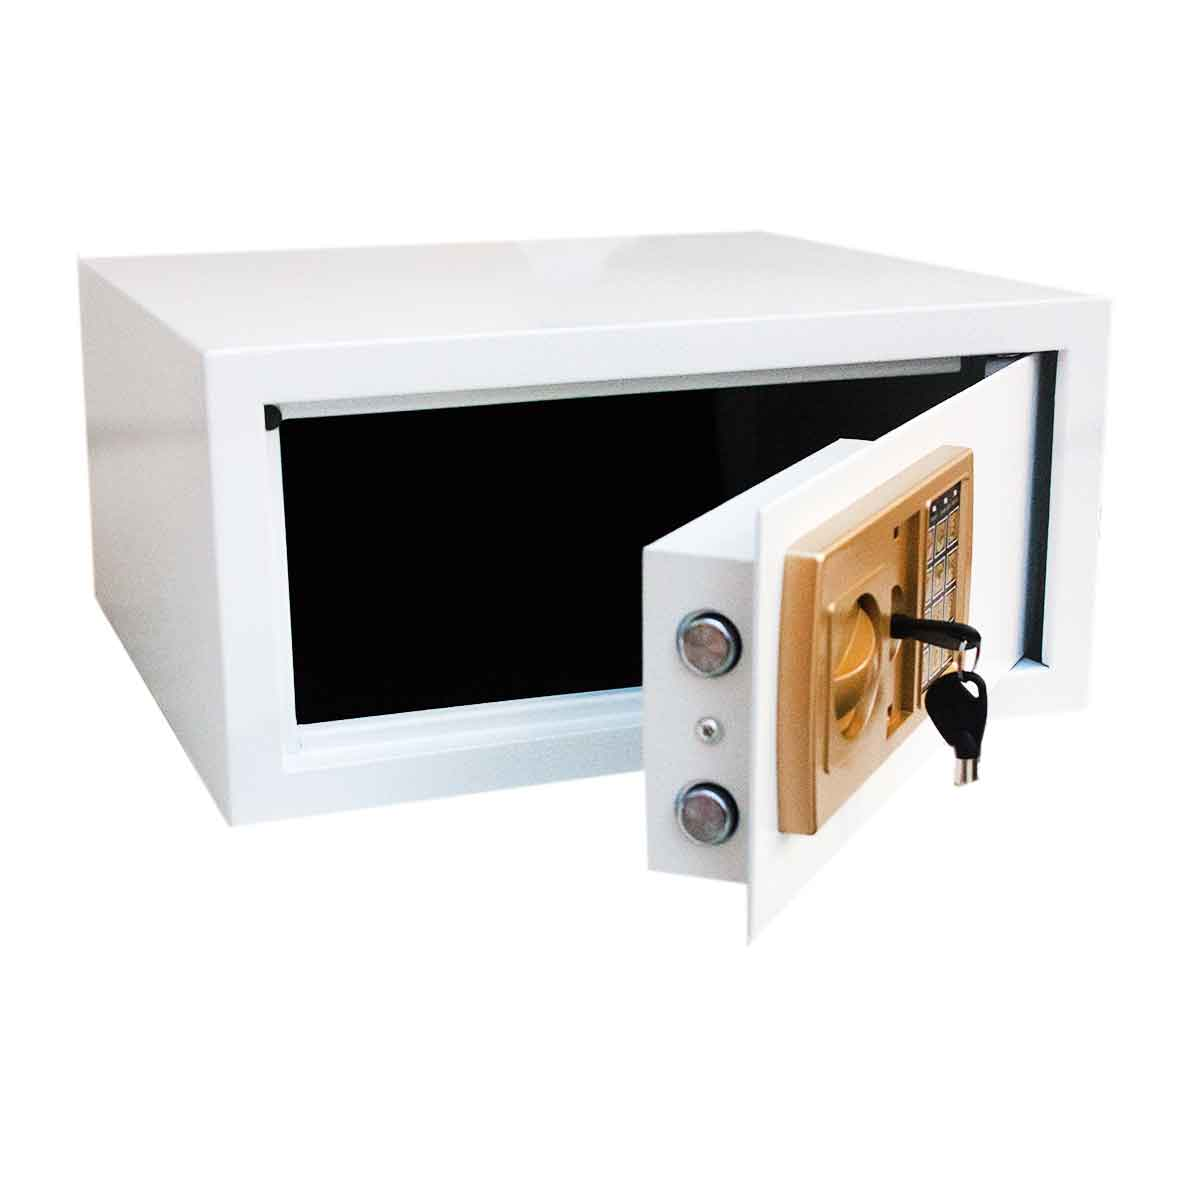 Cofre Eletrônico Digital Senha Grande Segredo 43x33x20cm Chave